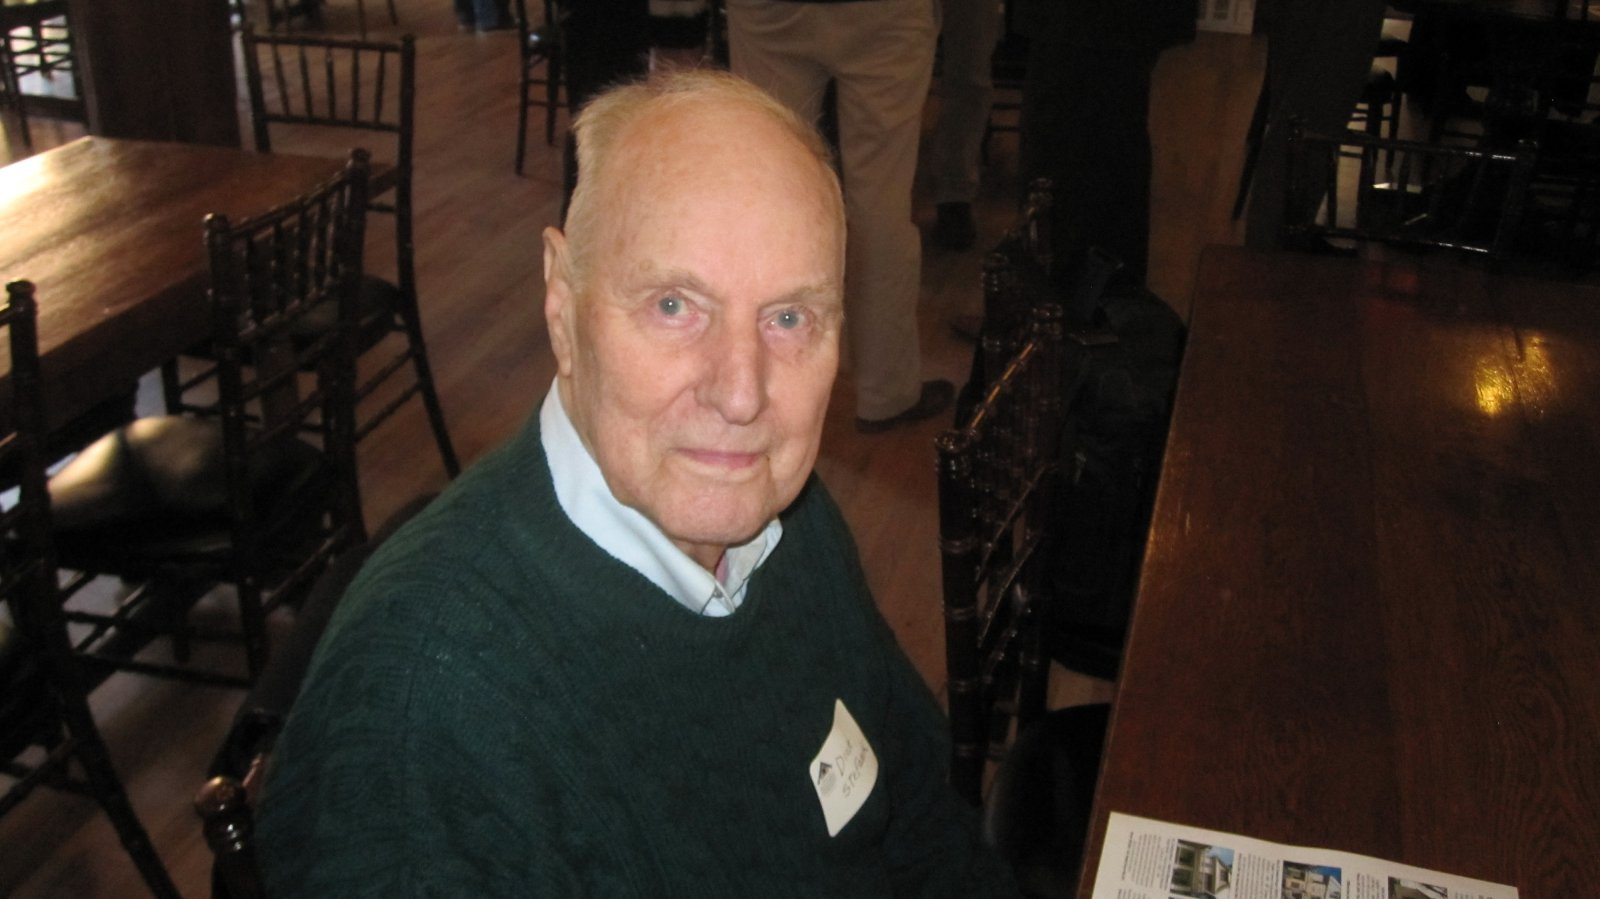 Richard Stefanek